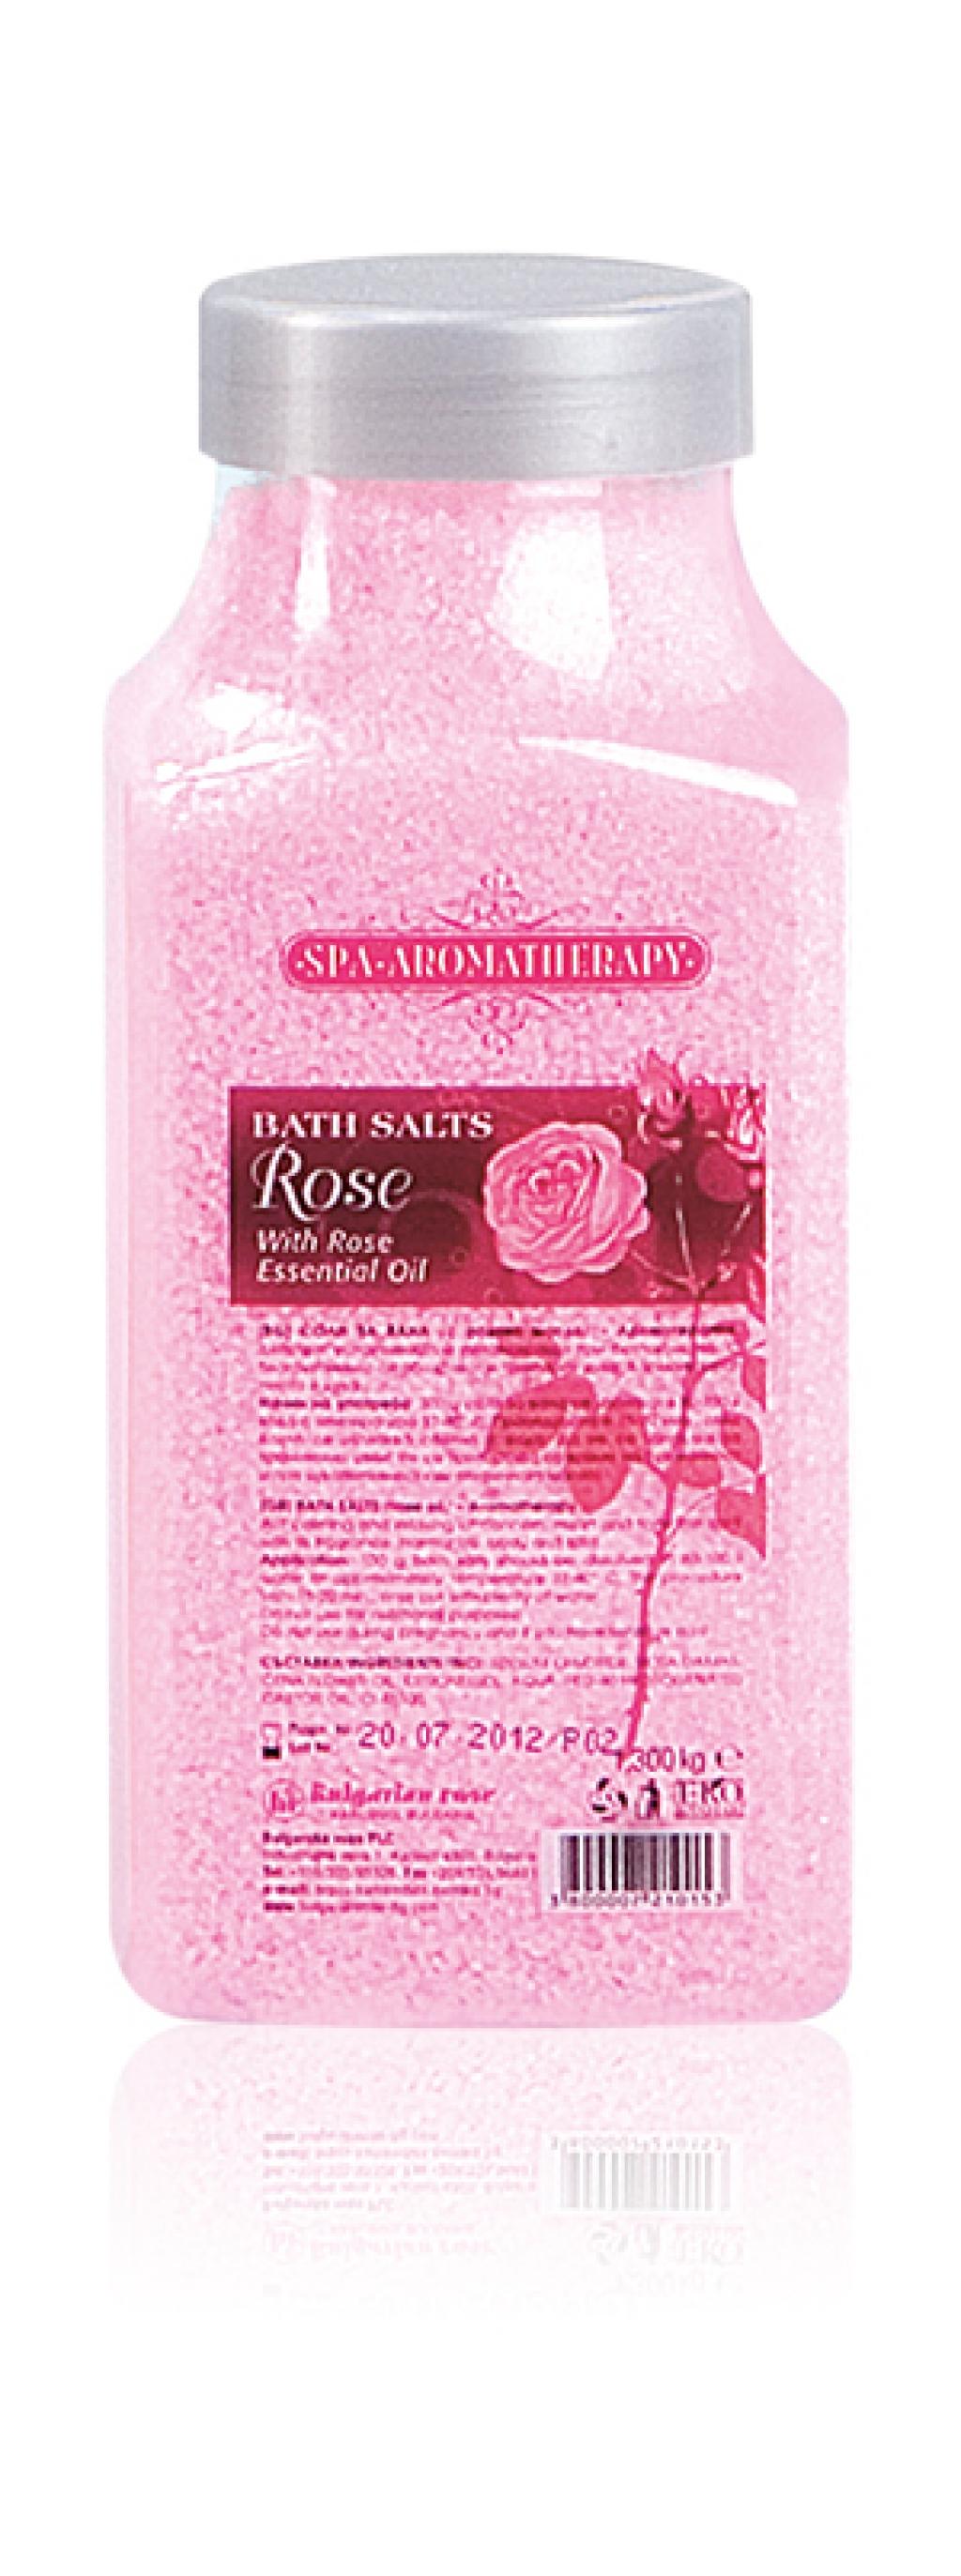 Bulgarian Bath Salts Rose - 440 g